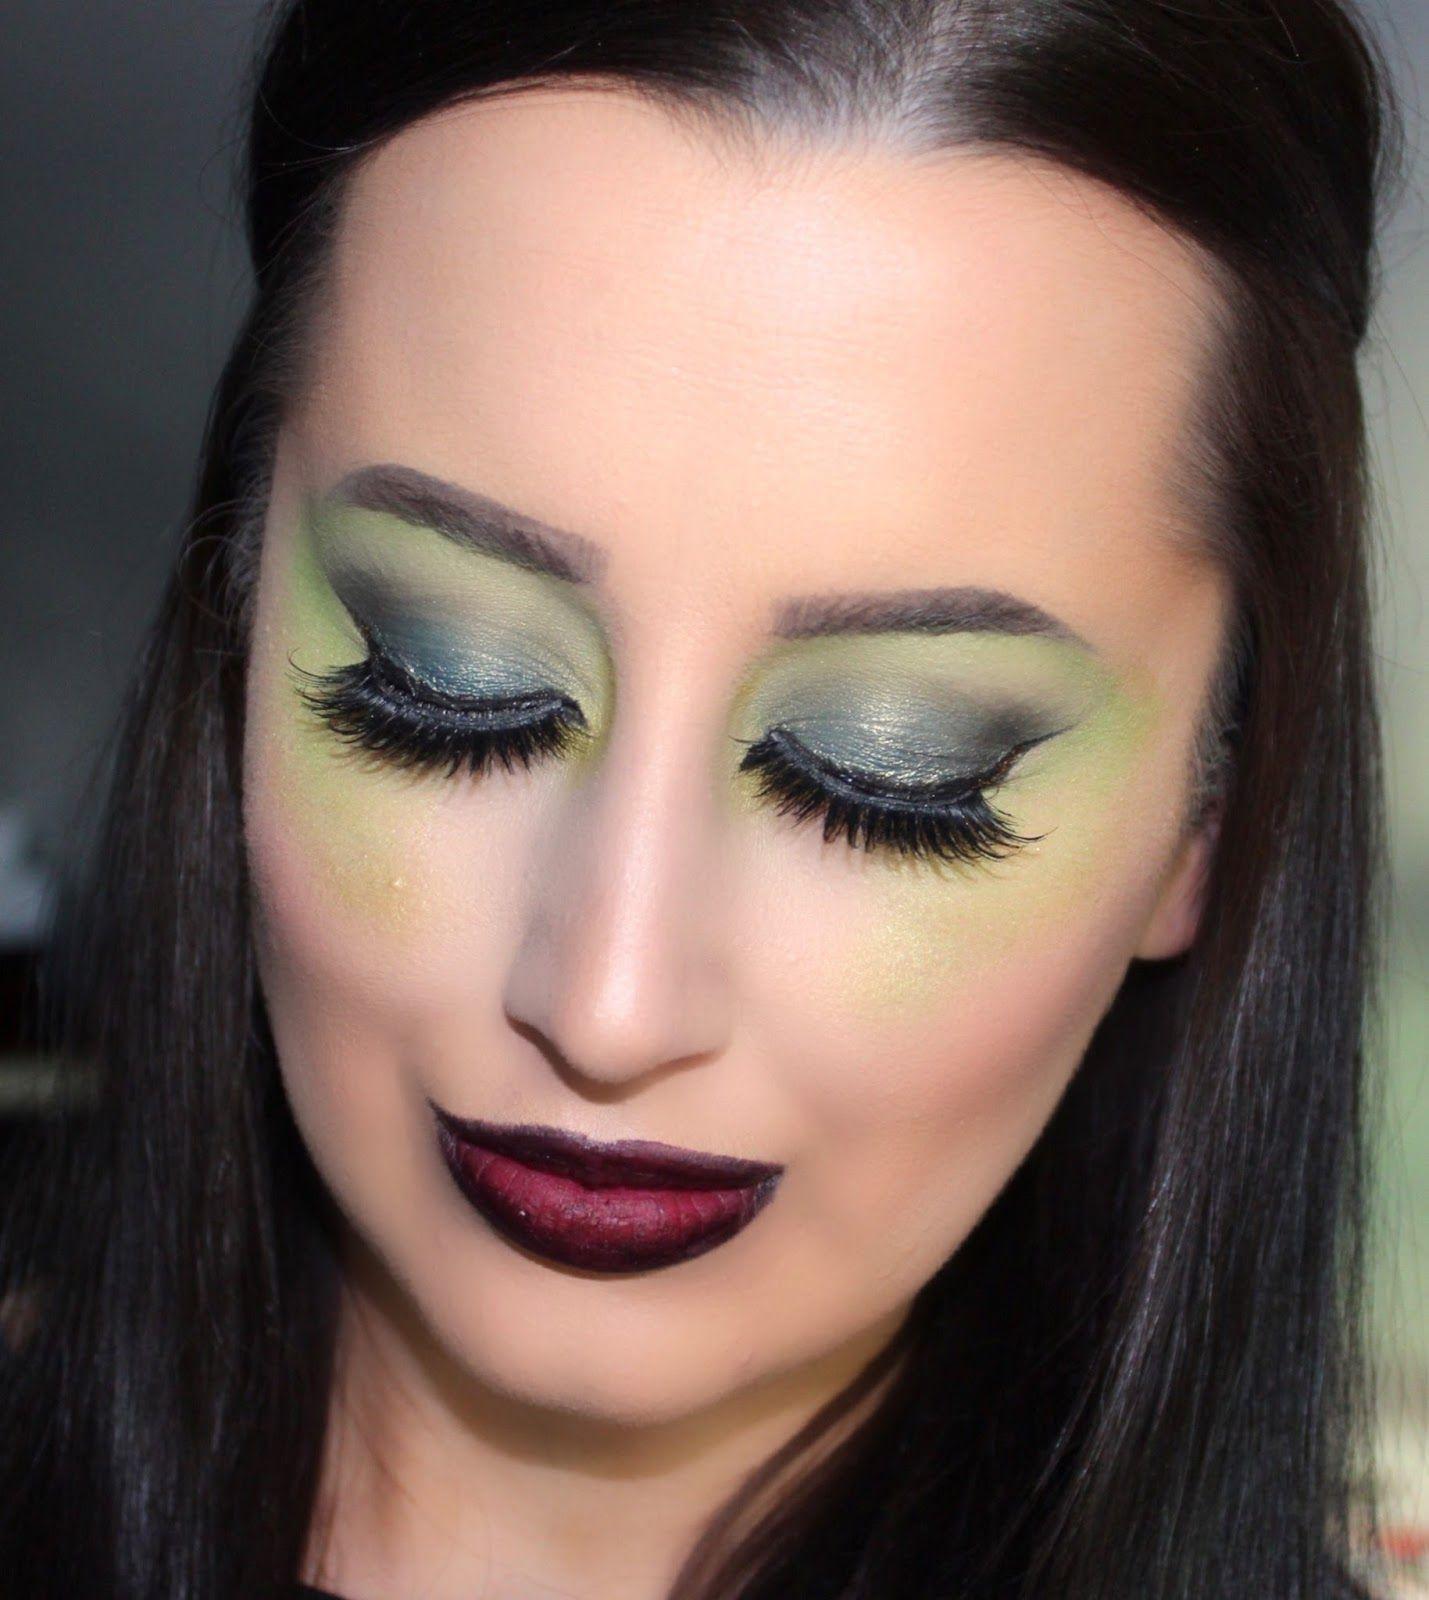 Wicked witch halloween makeup tutorial ashley elizabeth wicked witch halloween makeup tutorial ashley elizabeth baditri Images